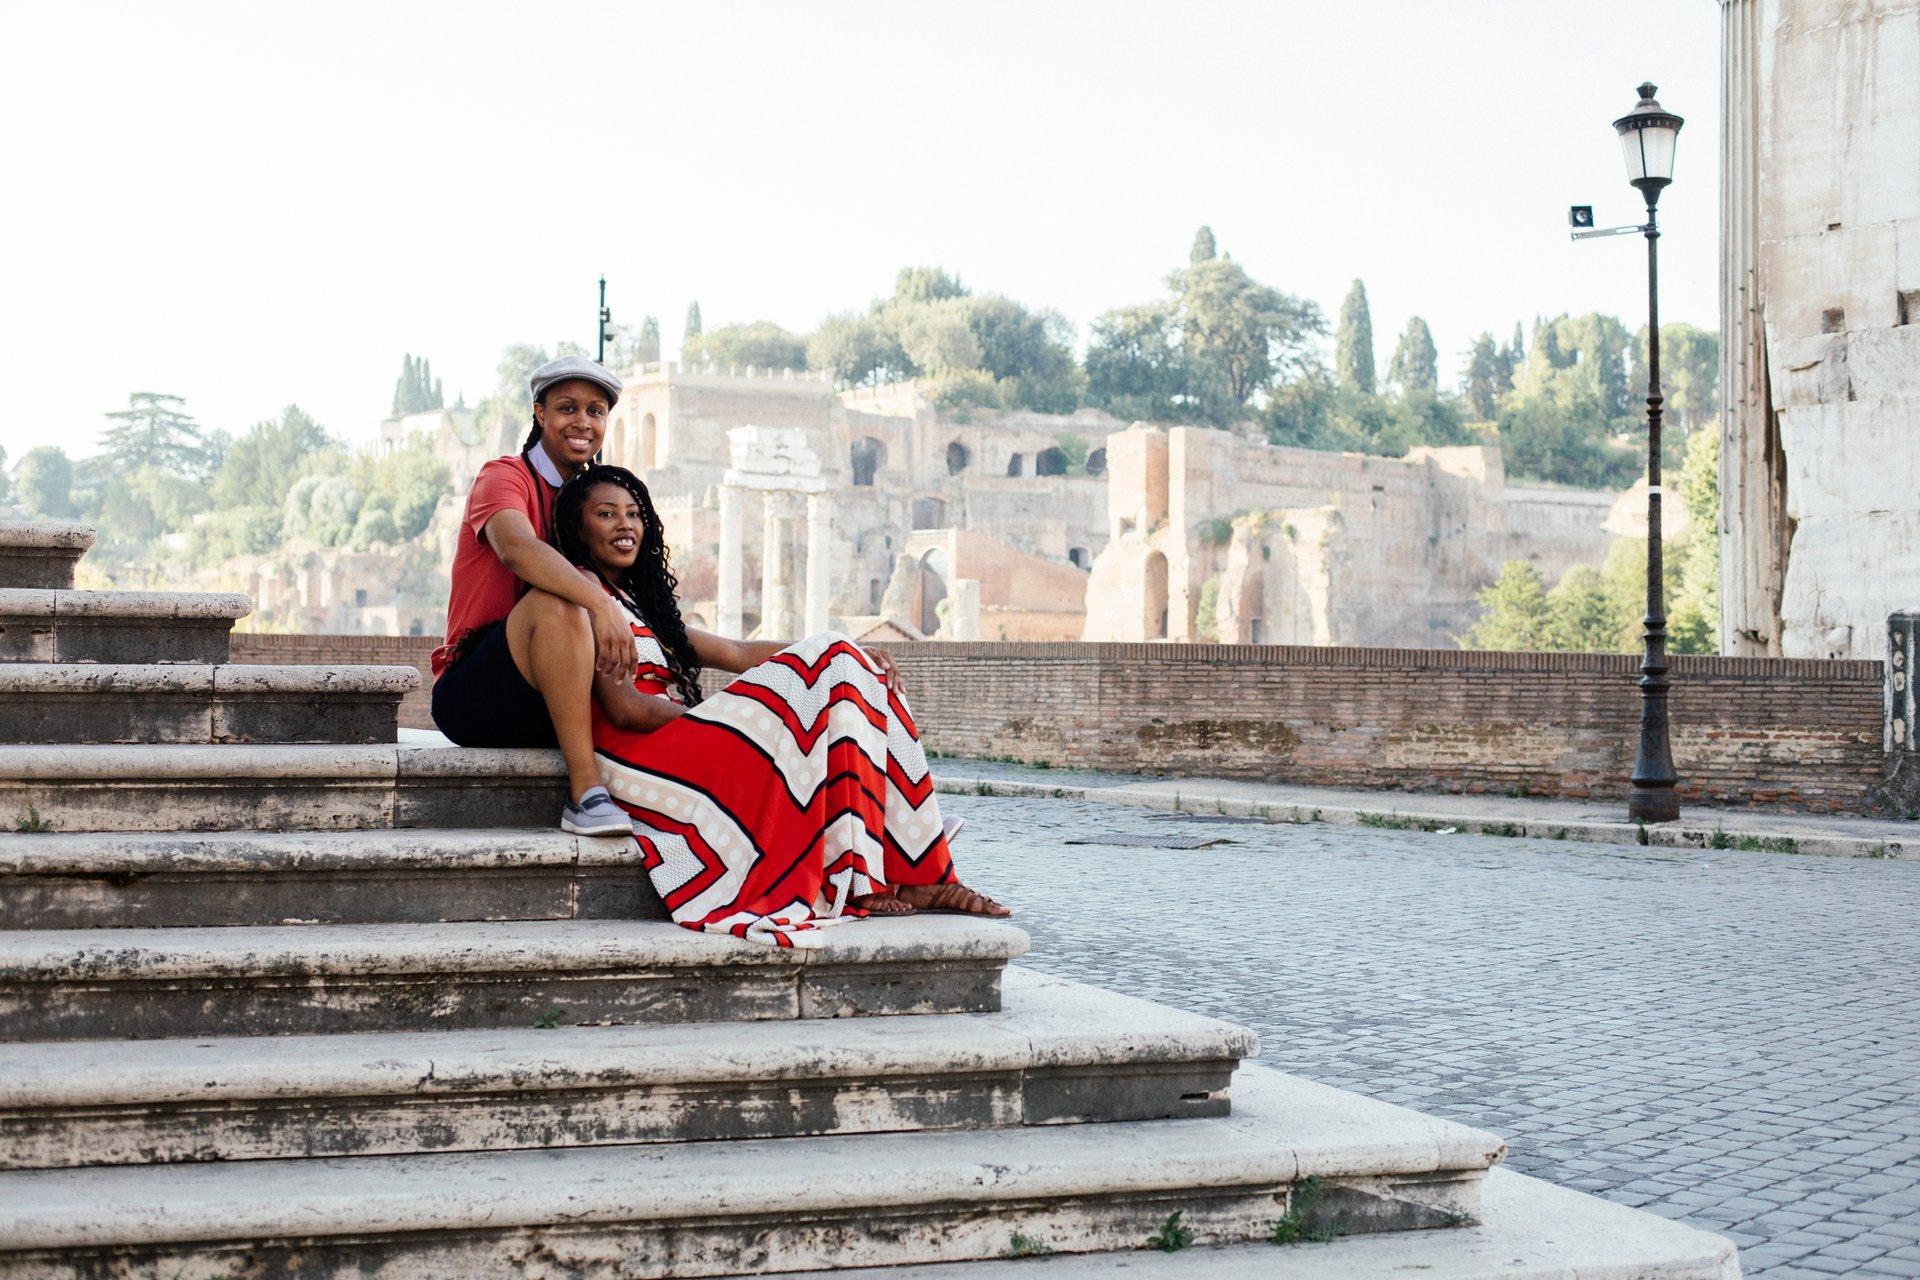 Rome-Italy-travel-story-Flytographer-24